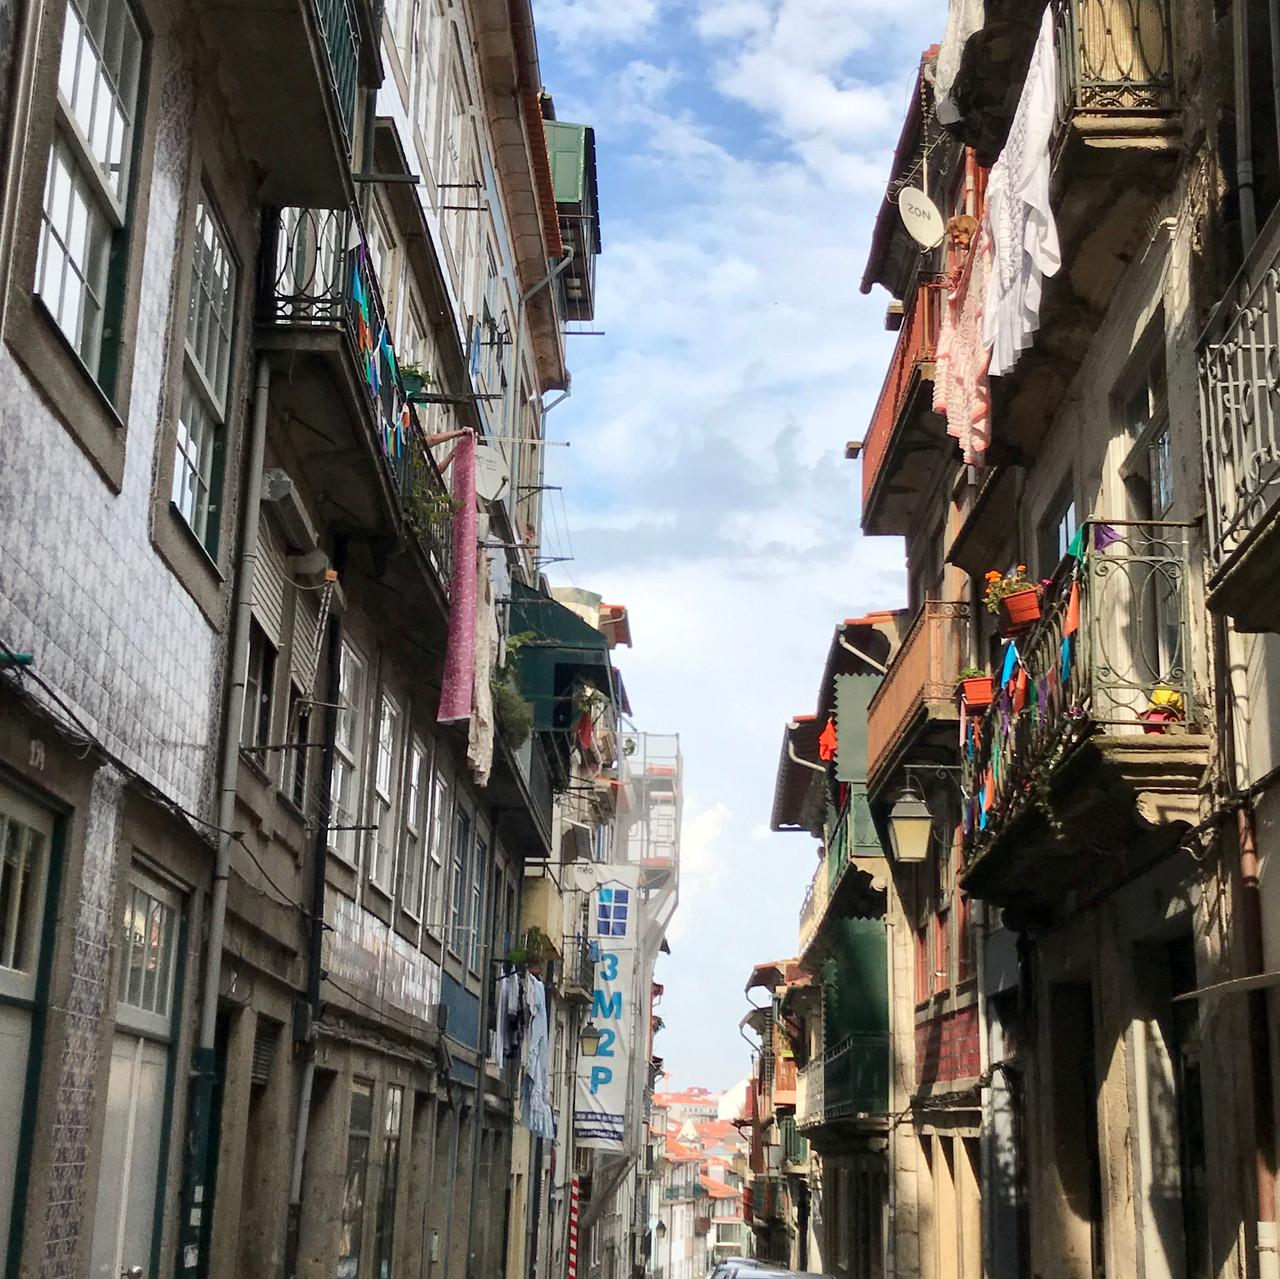 Quaint Narrow Alleyways